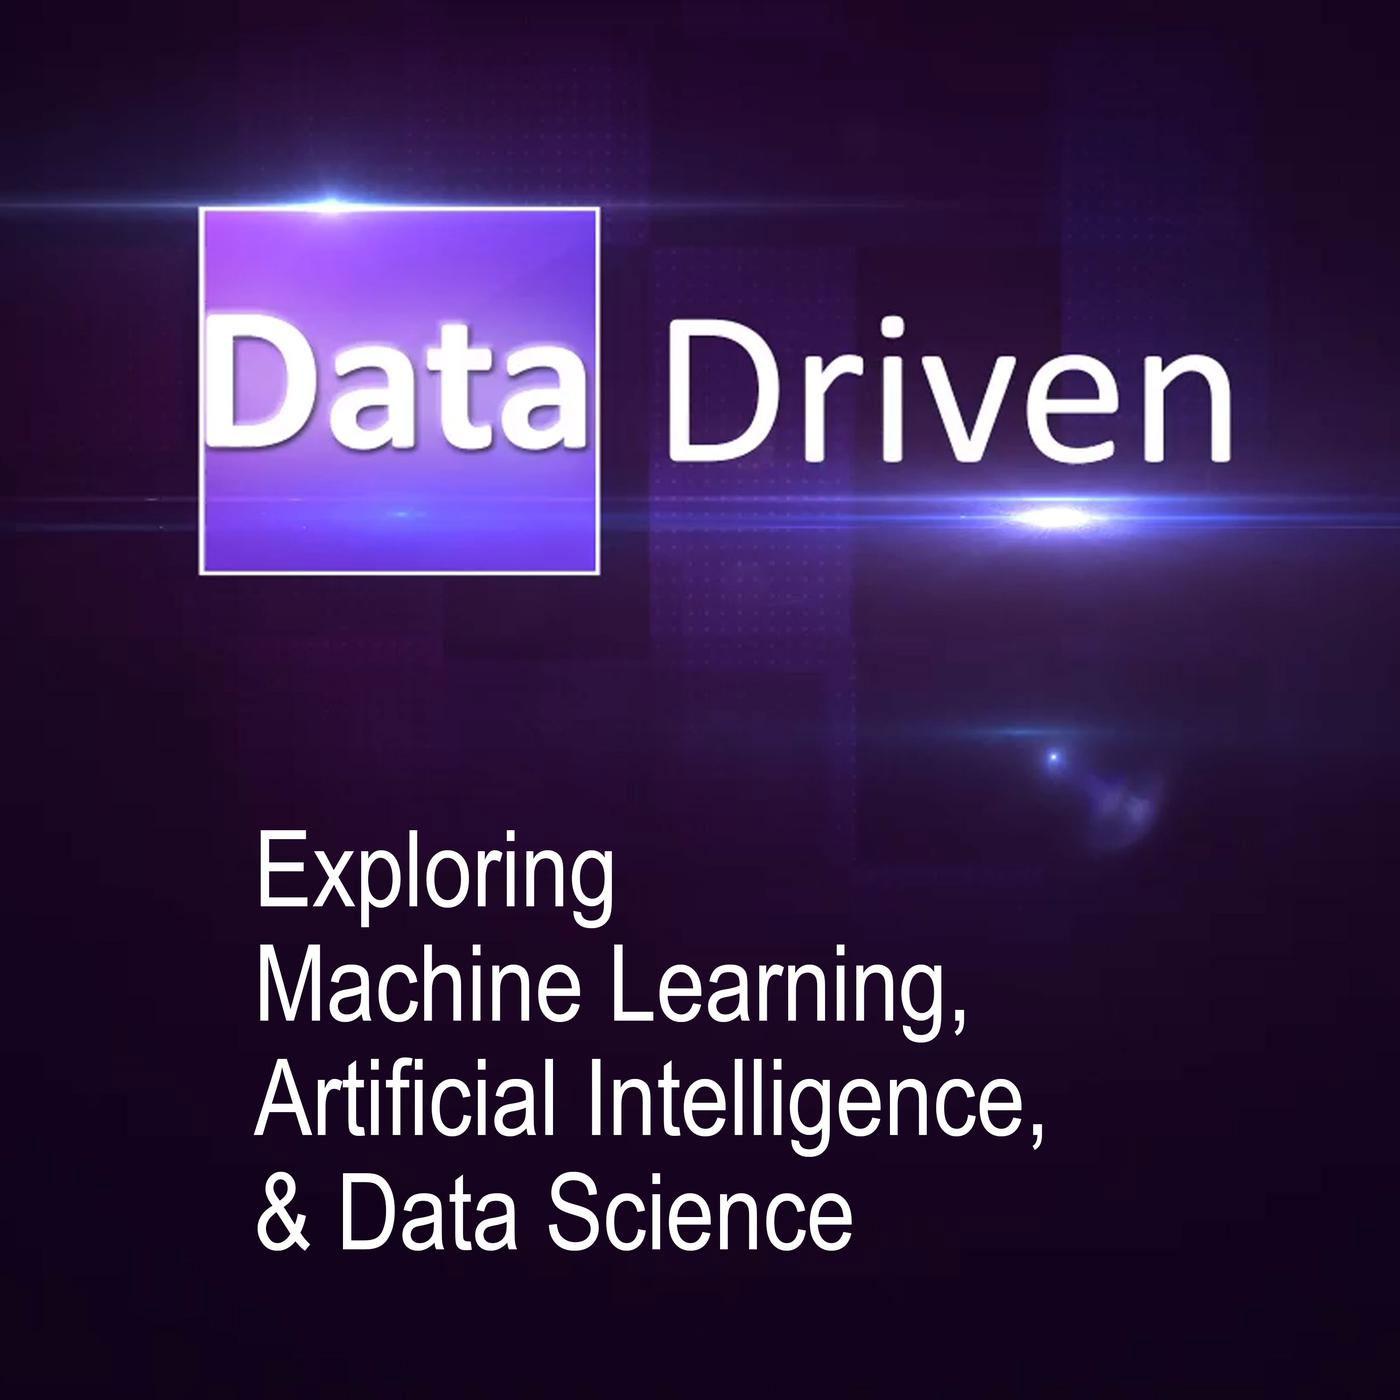 Data Driven Podcast